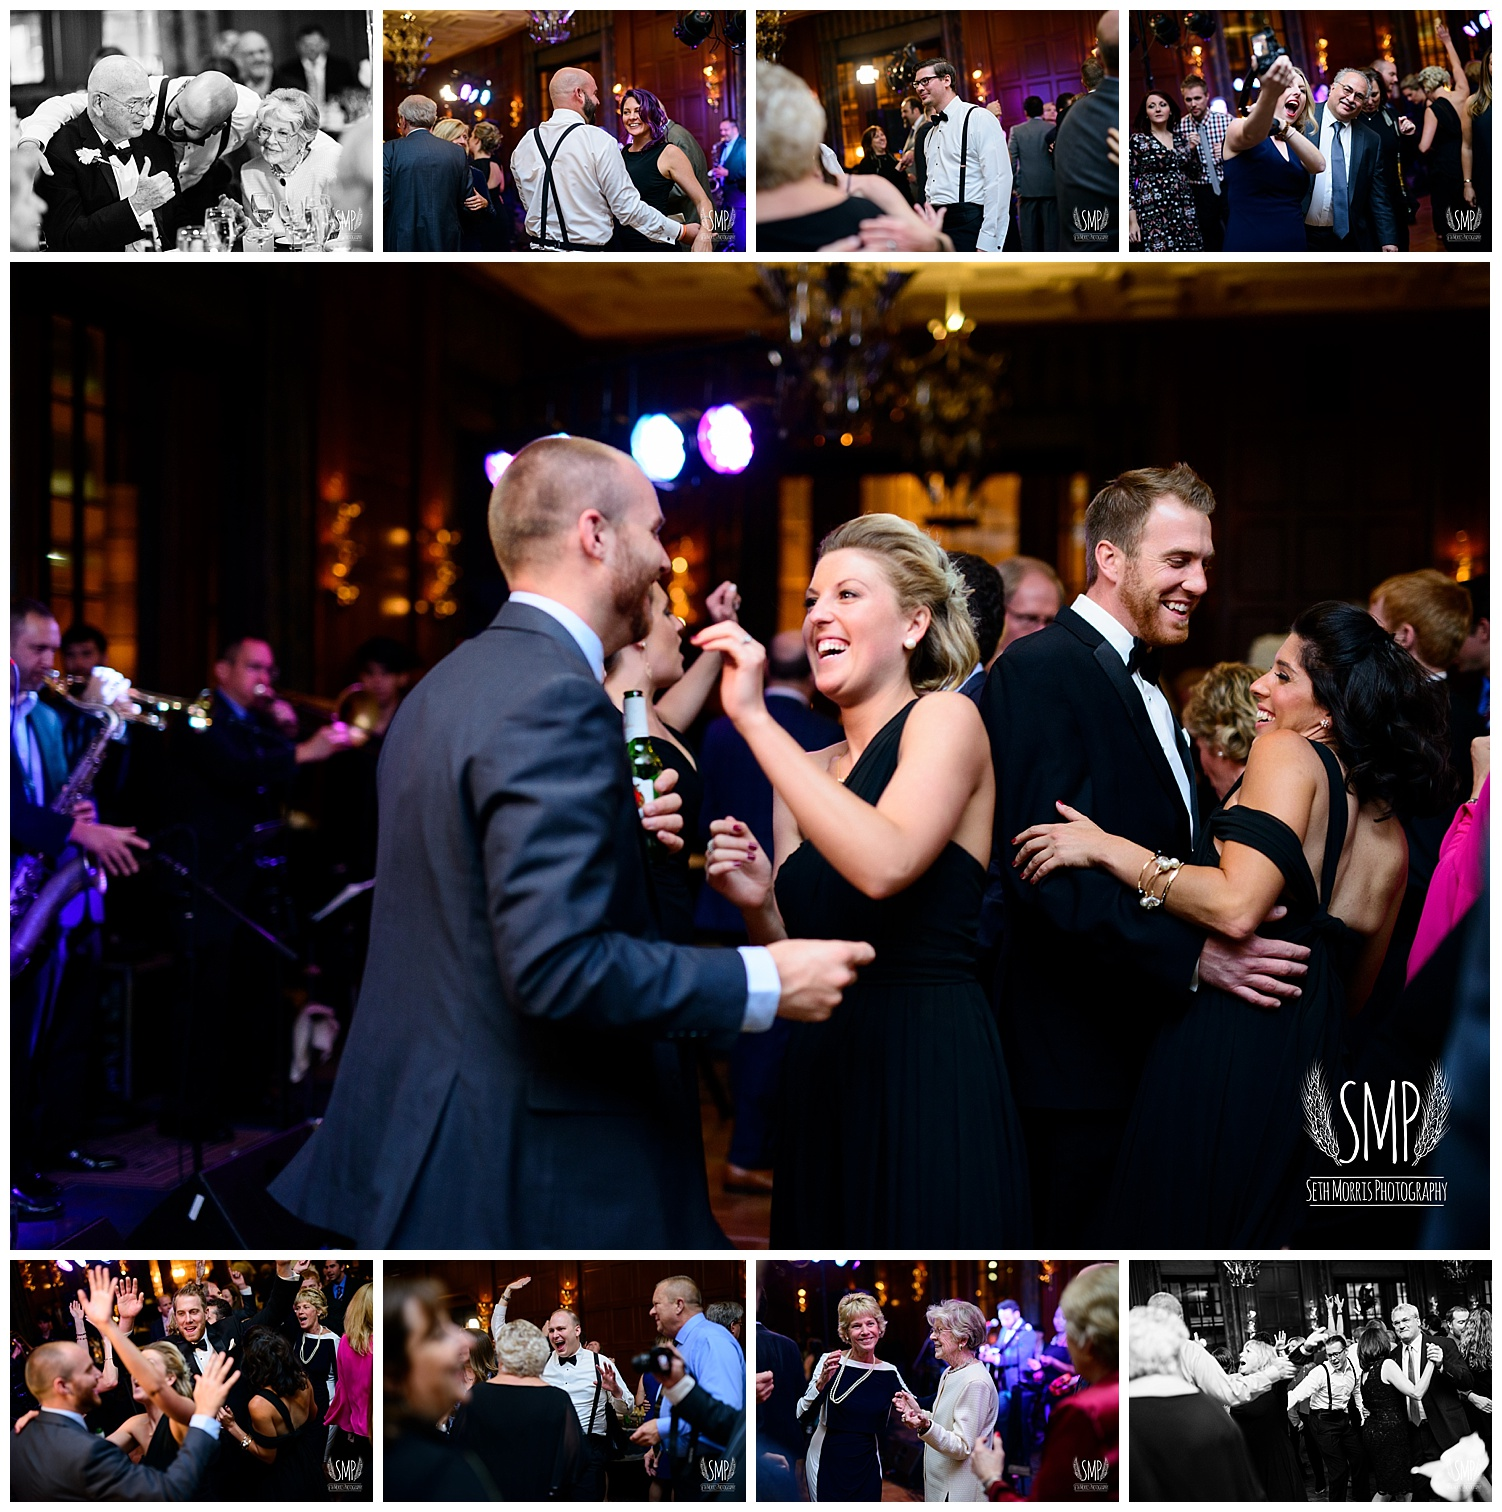 chicago-wedding-pictures-del-strada-hotel-allegro-134.jpg